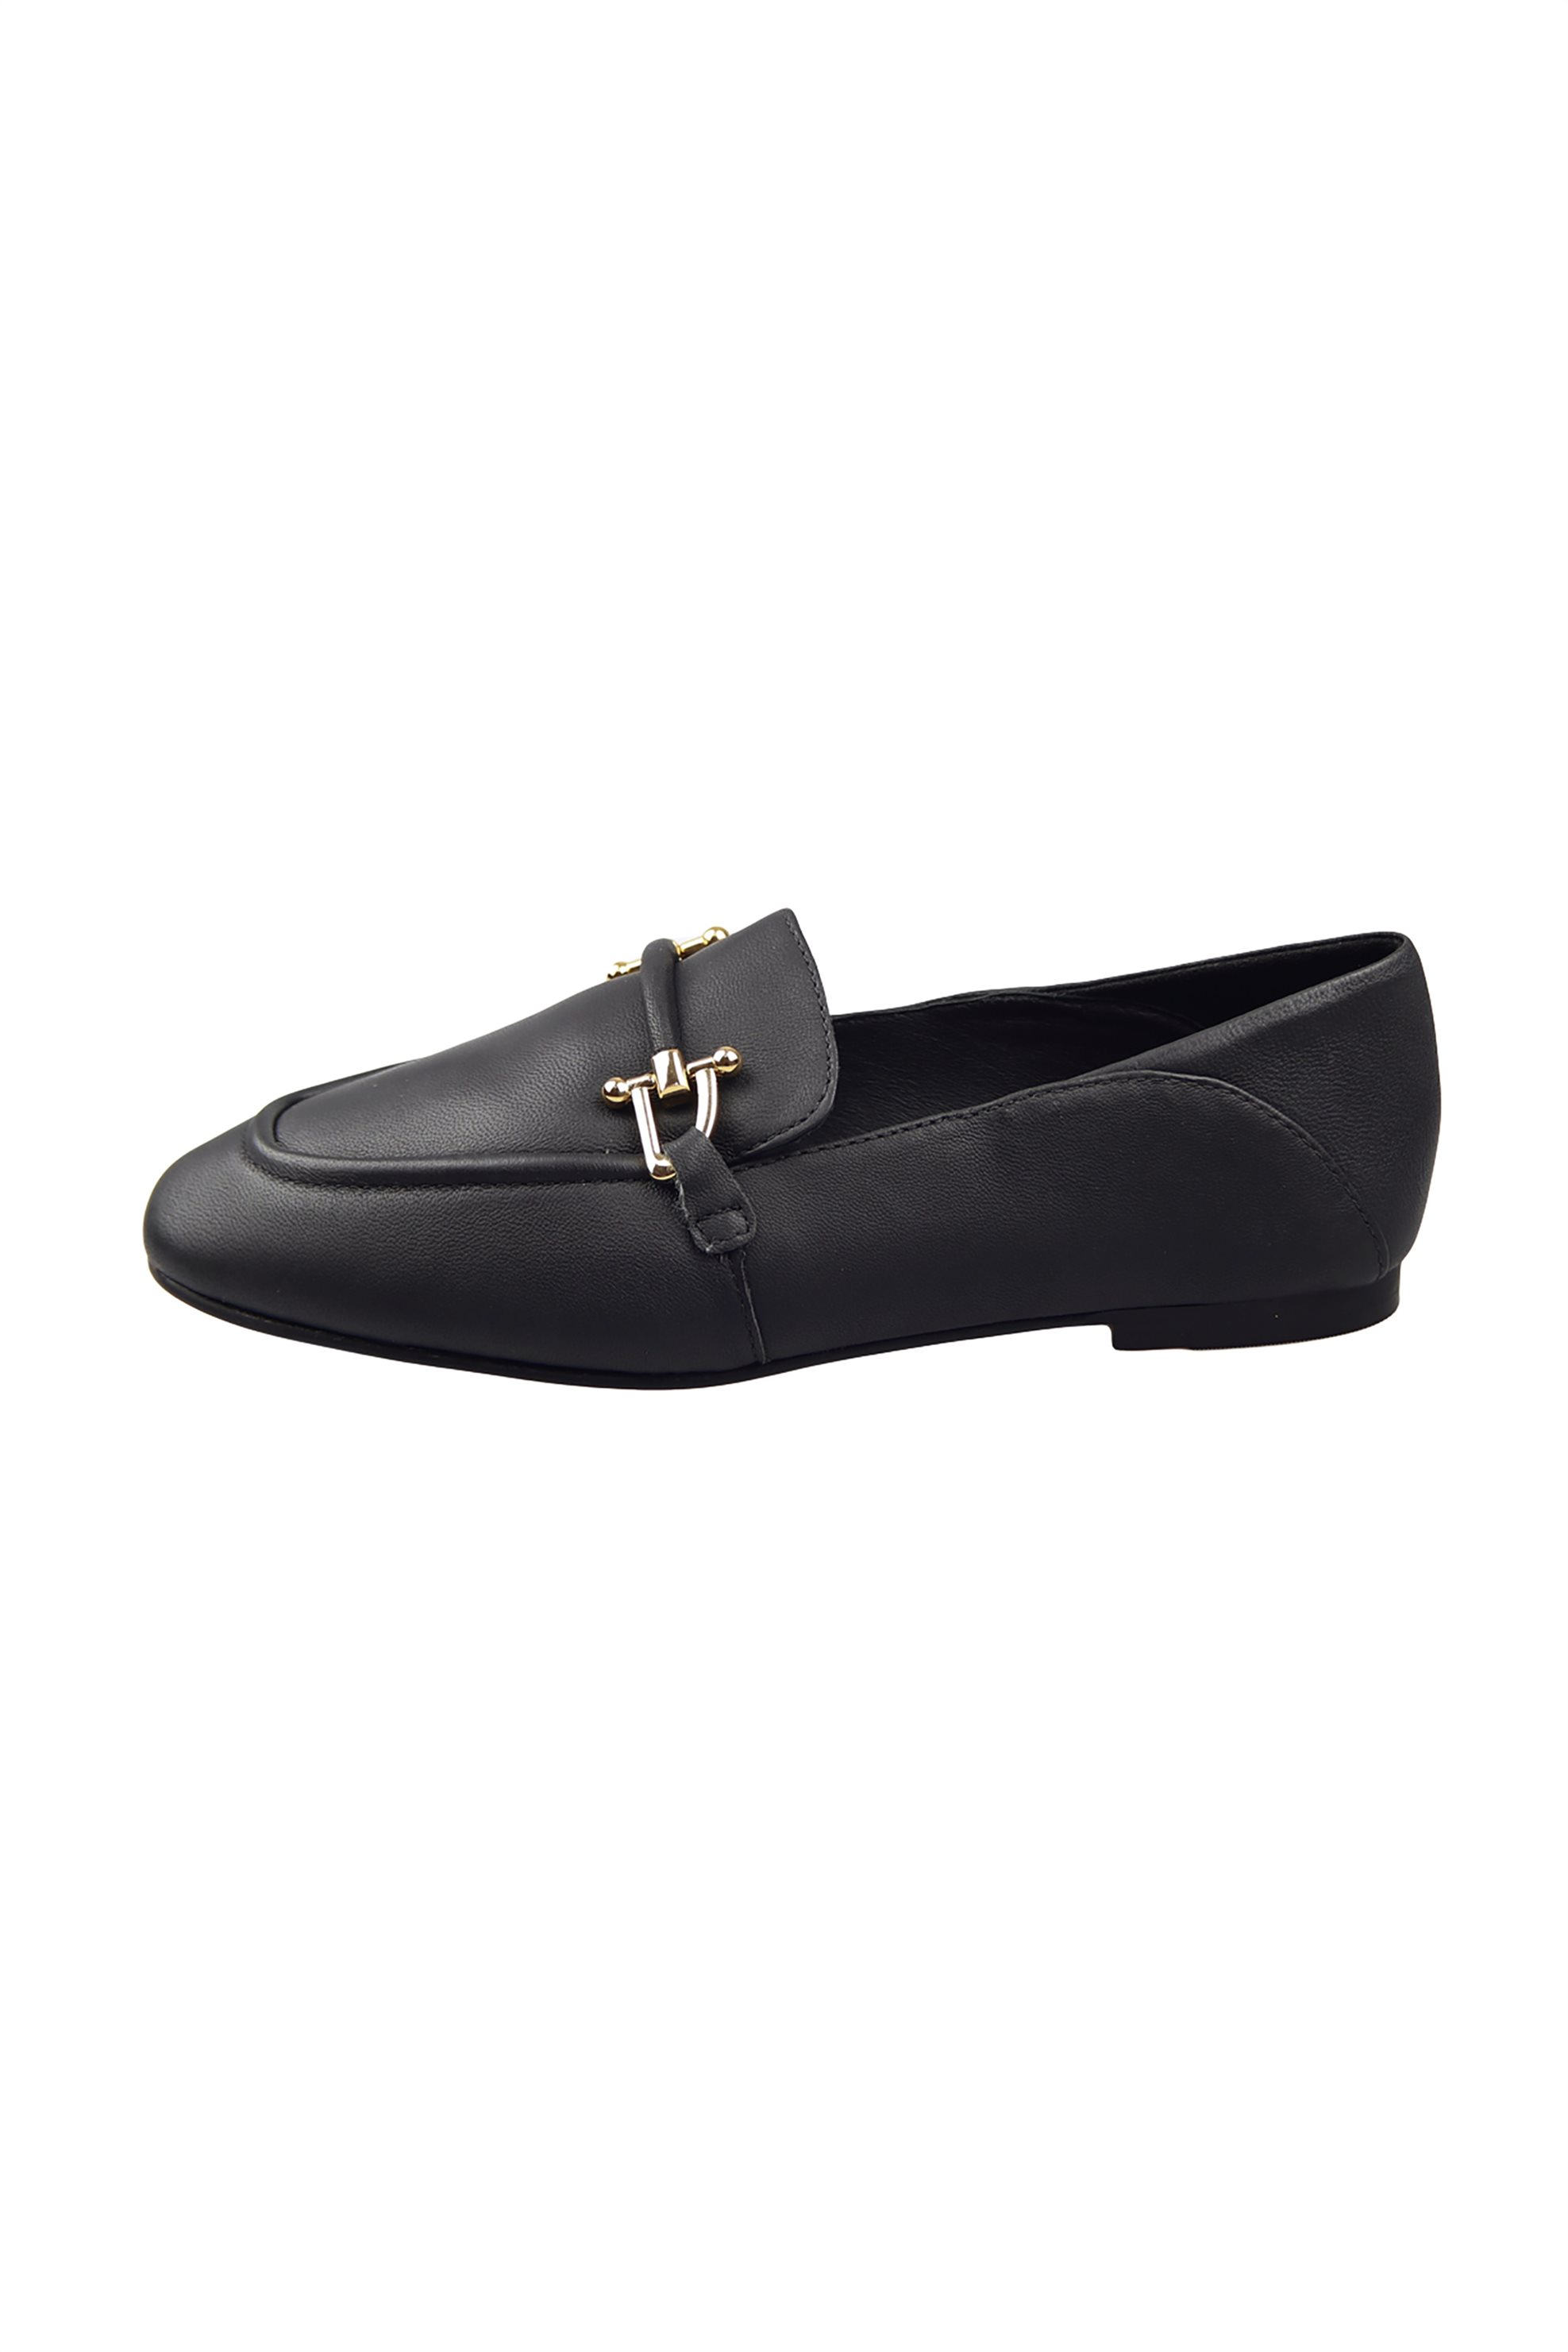 Clarks γυναικεία loafers με μεταλλική αγκραφα